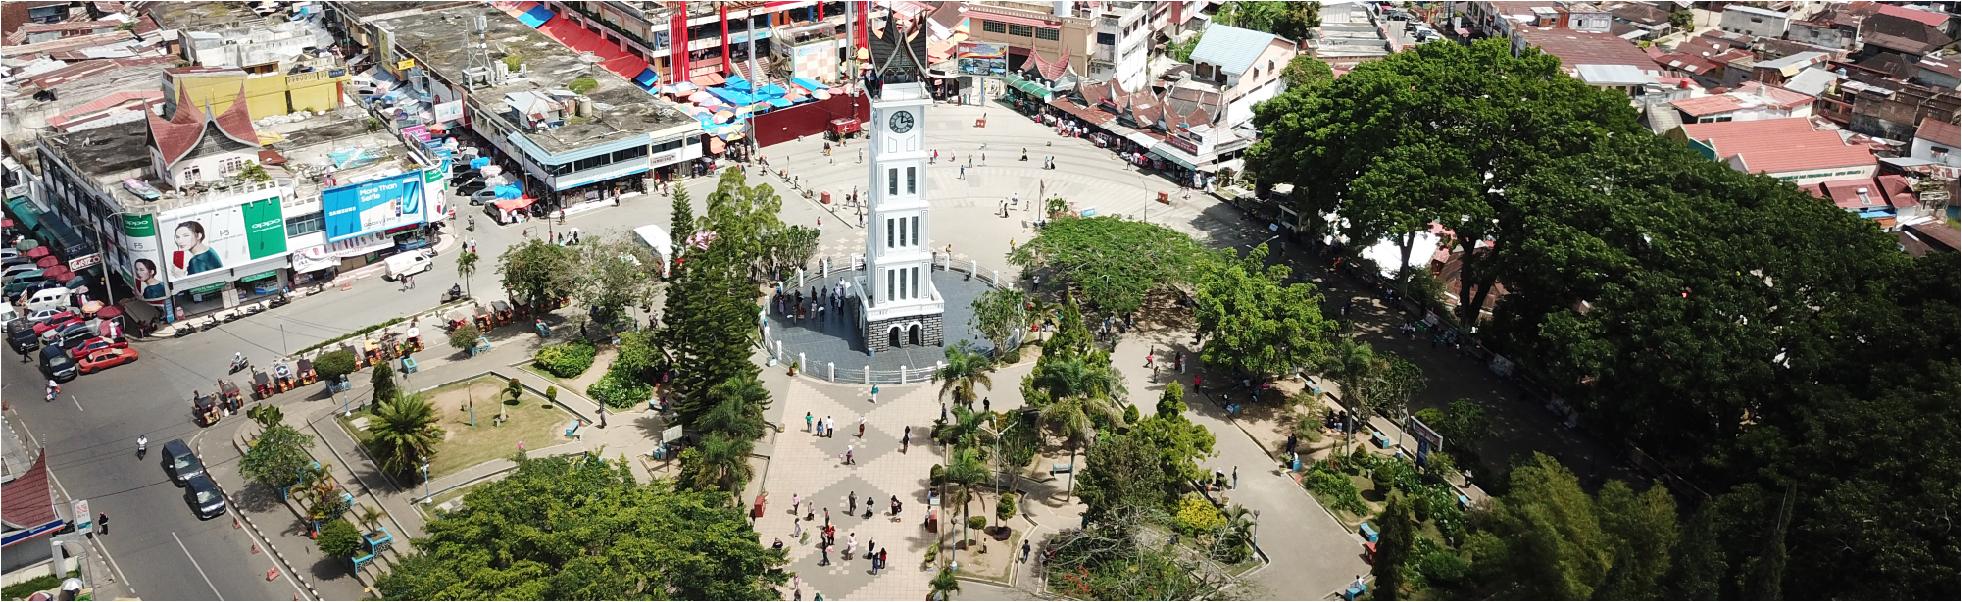 Paket Tour Padang Bukittinggi Mandeh 4D3N Terlengkap